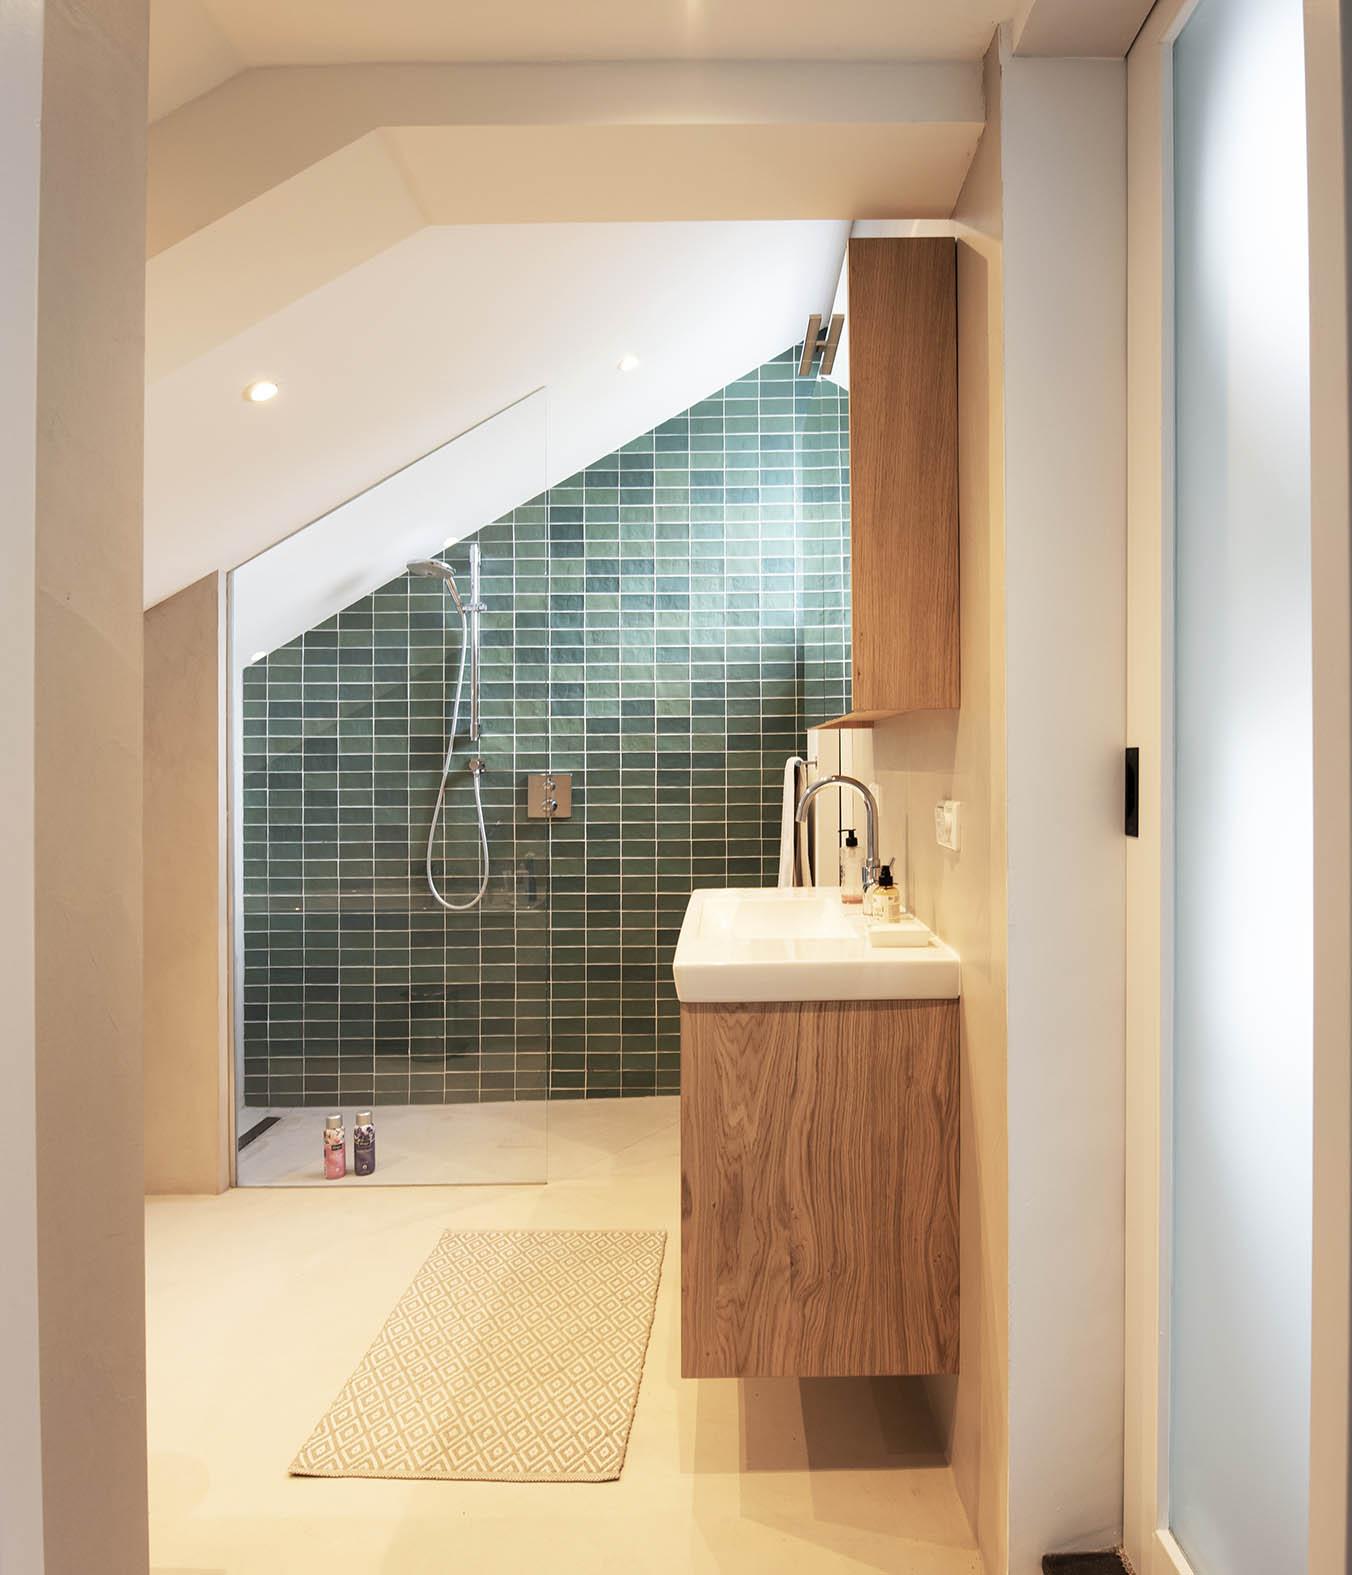 slaapkamer met badkamer groene tegels interieuradvies den bosch